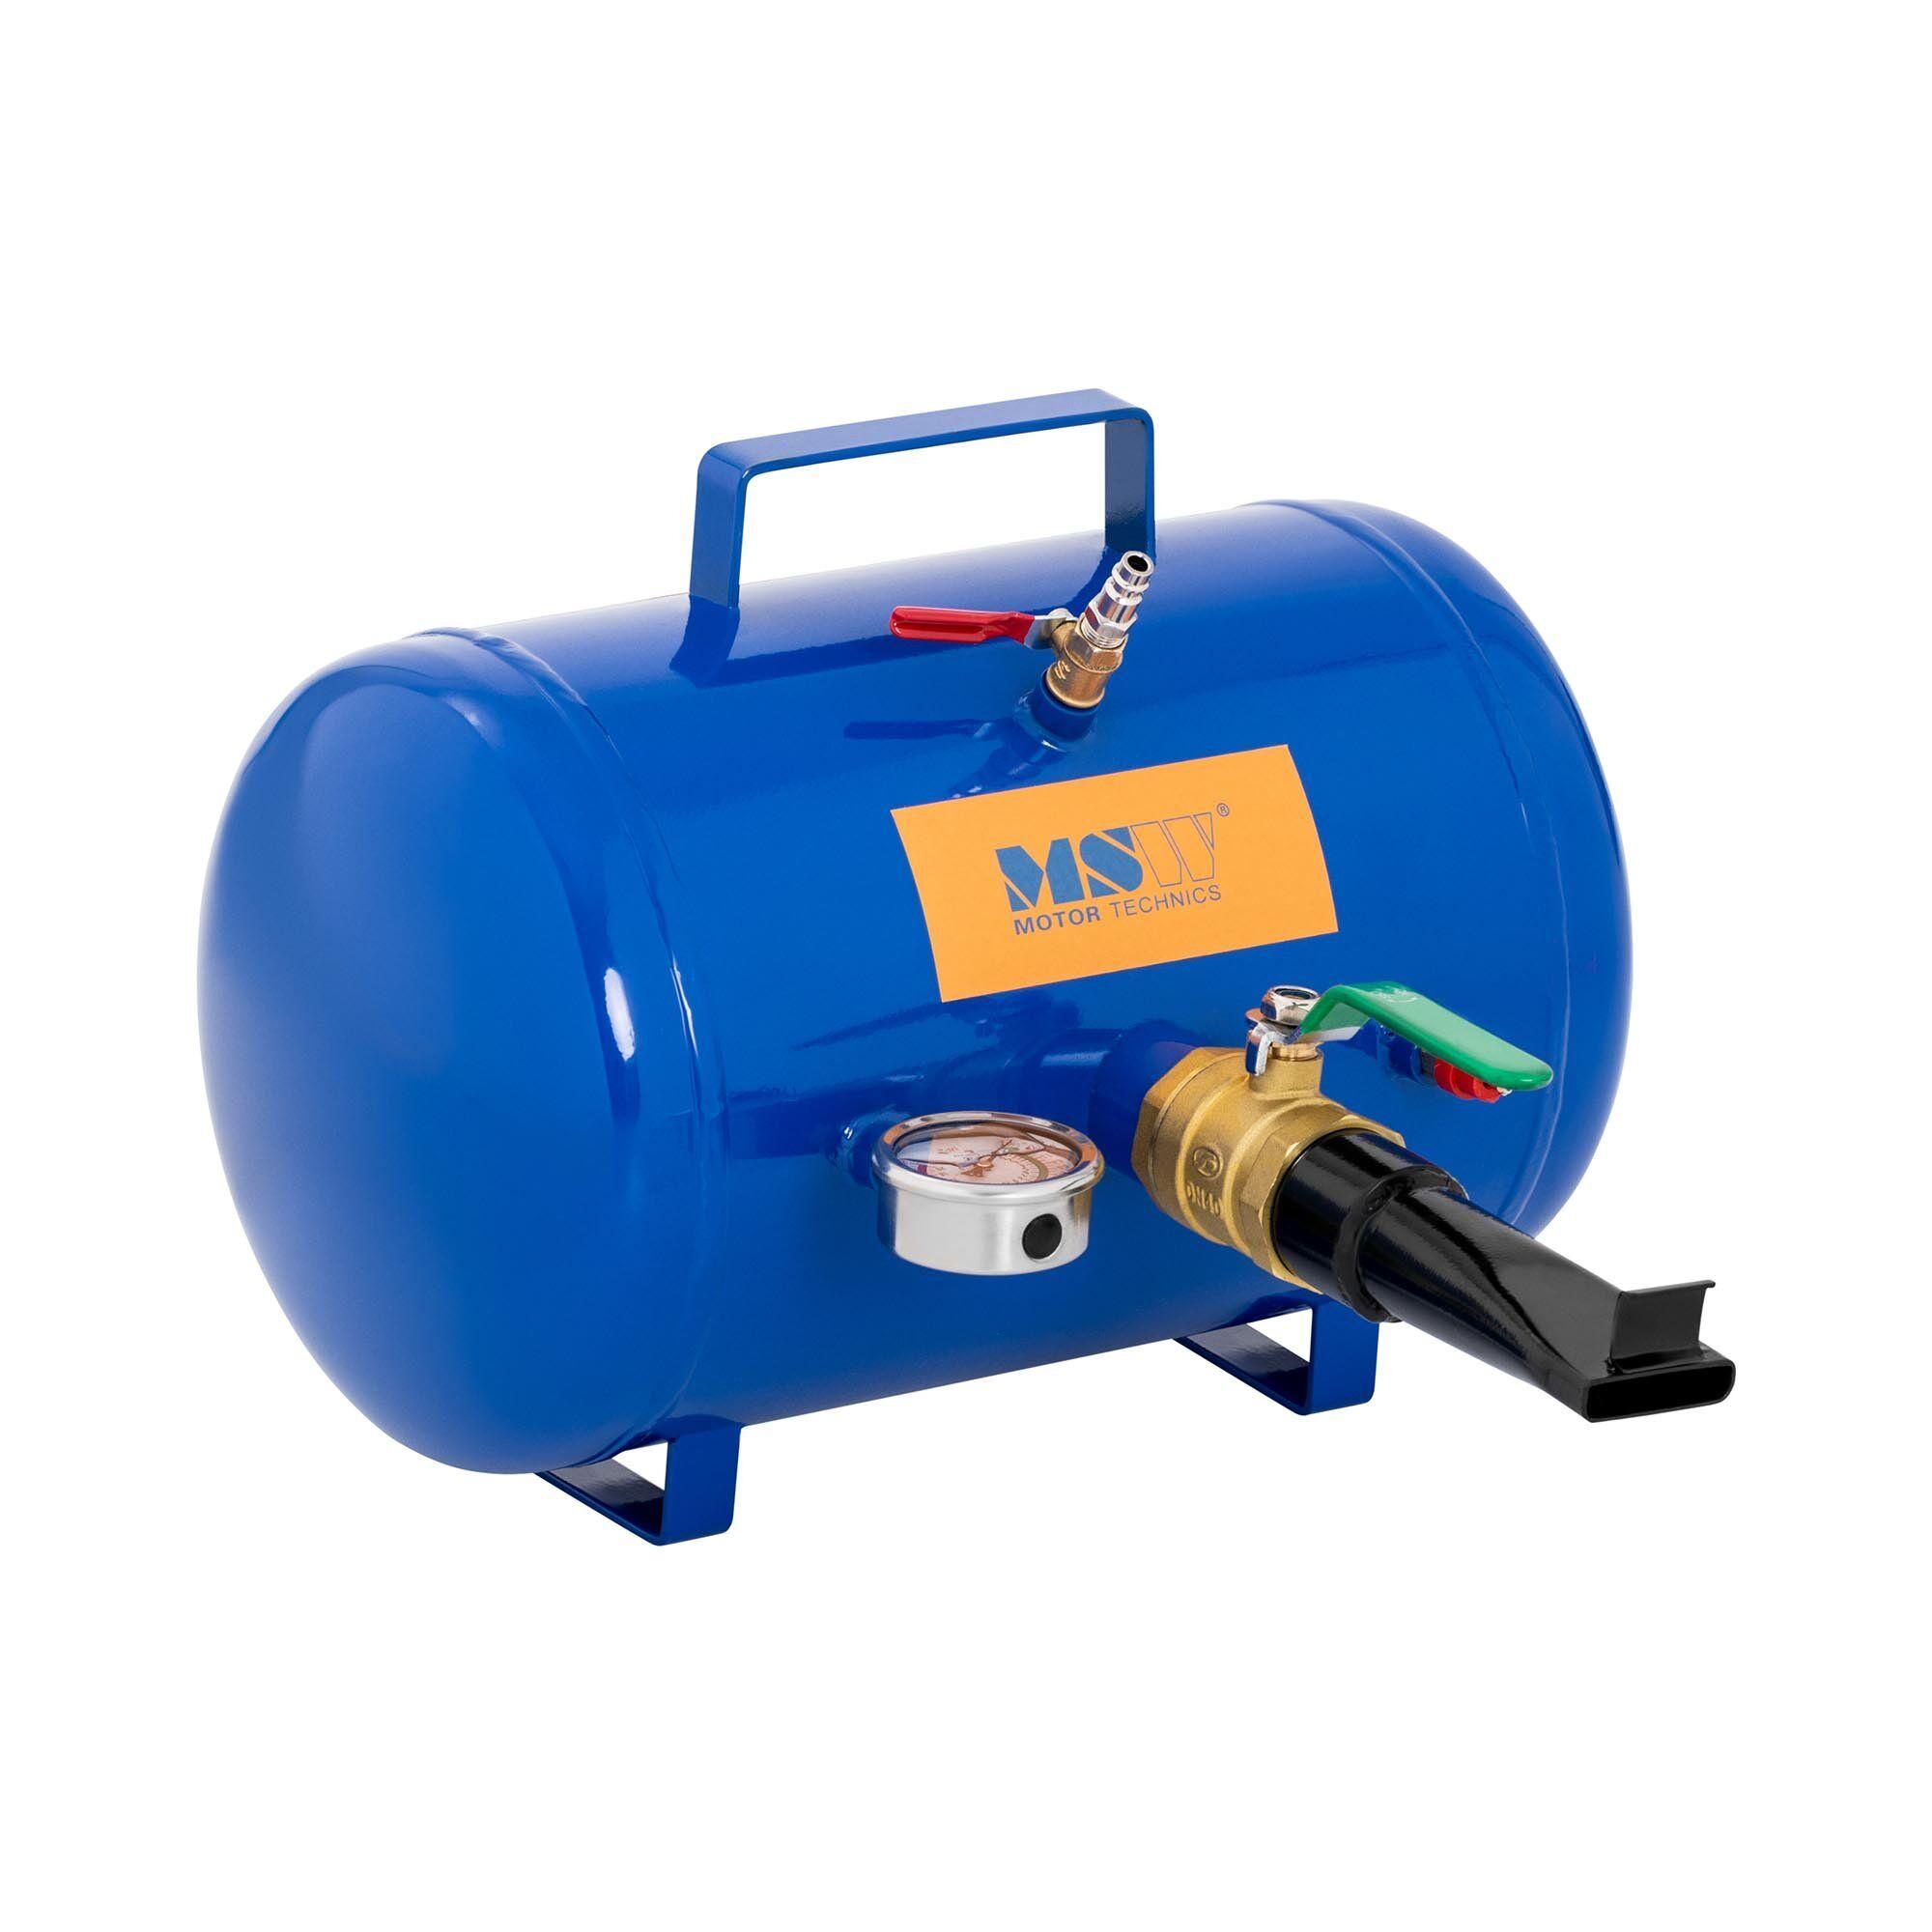 MSW Tallonatore per gomme - 19,5 L - 8 bar -TY-1